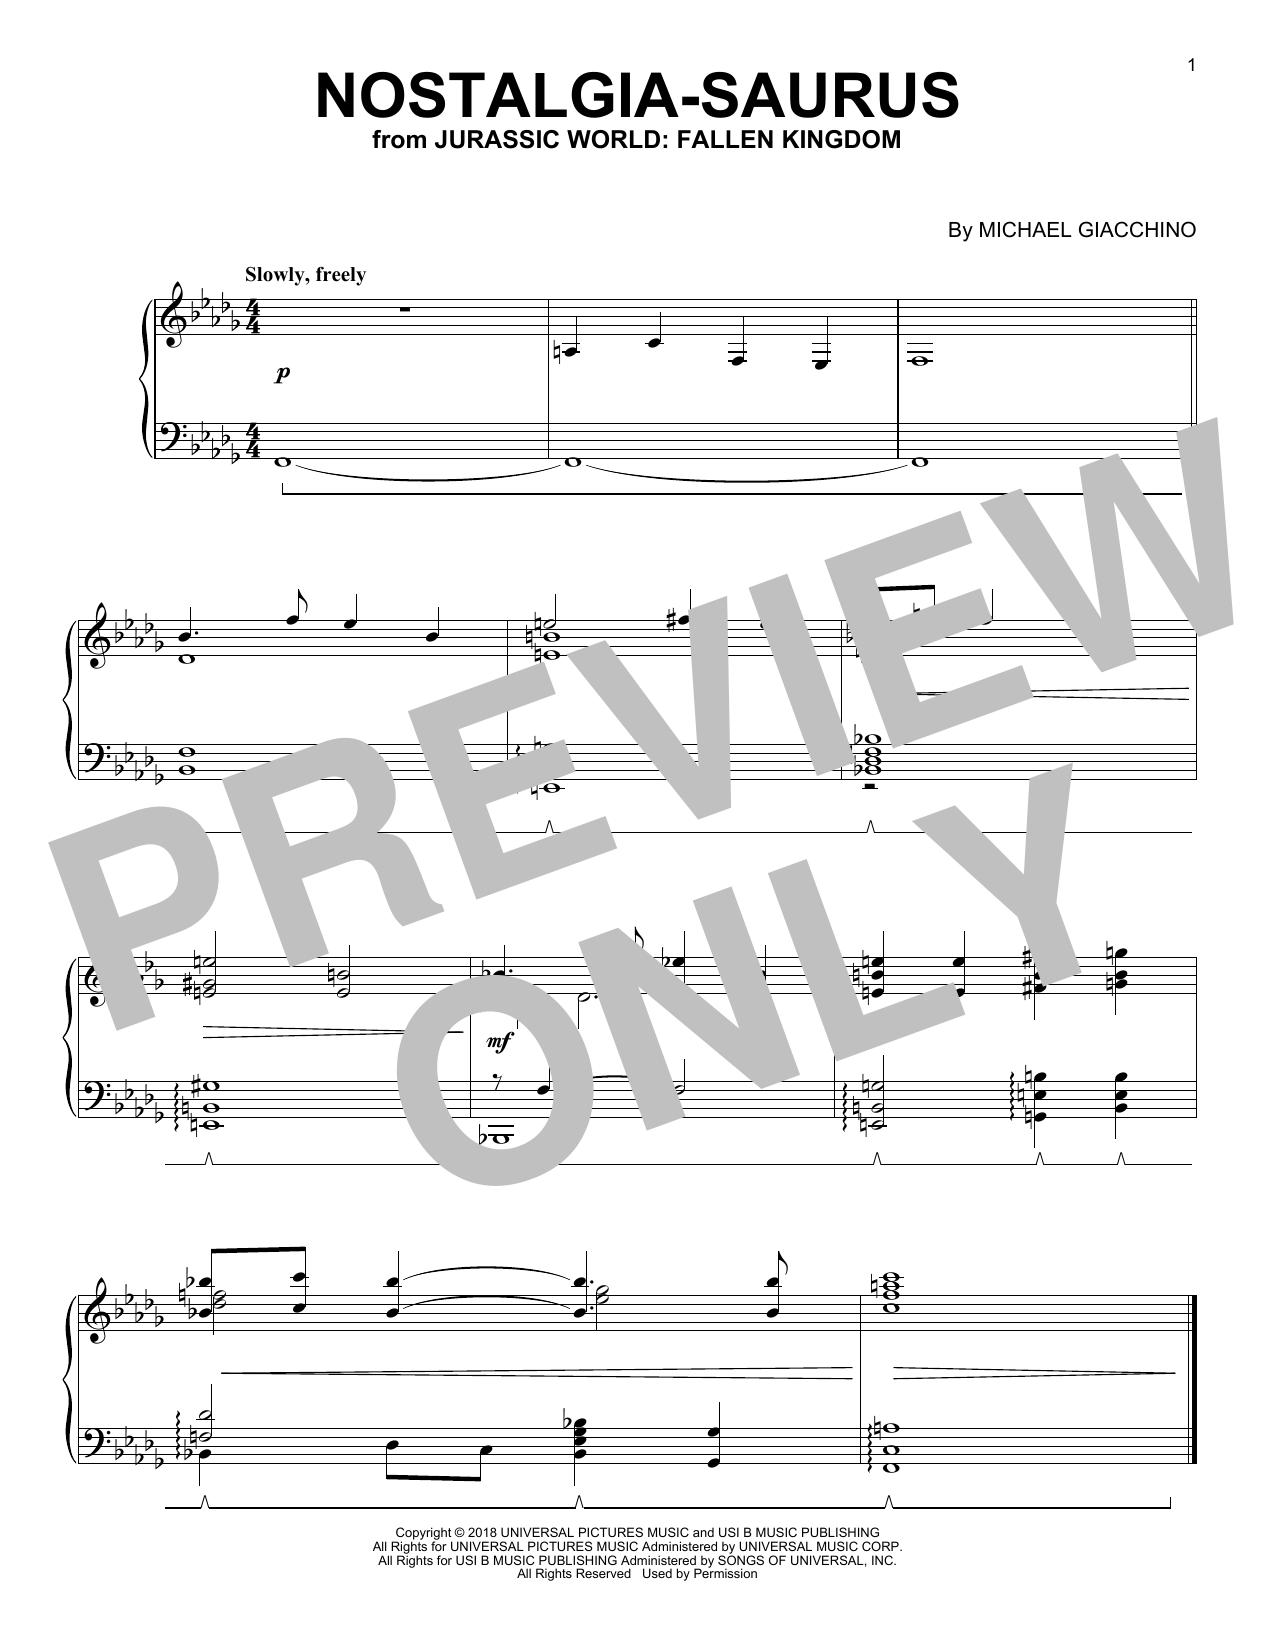 Michael Giacchino Nostalgia-Saurus (from Jurassic World: Fallen Kingdom) sheet music notes and chords. Download Printable PDF.